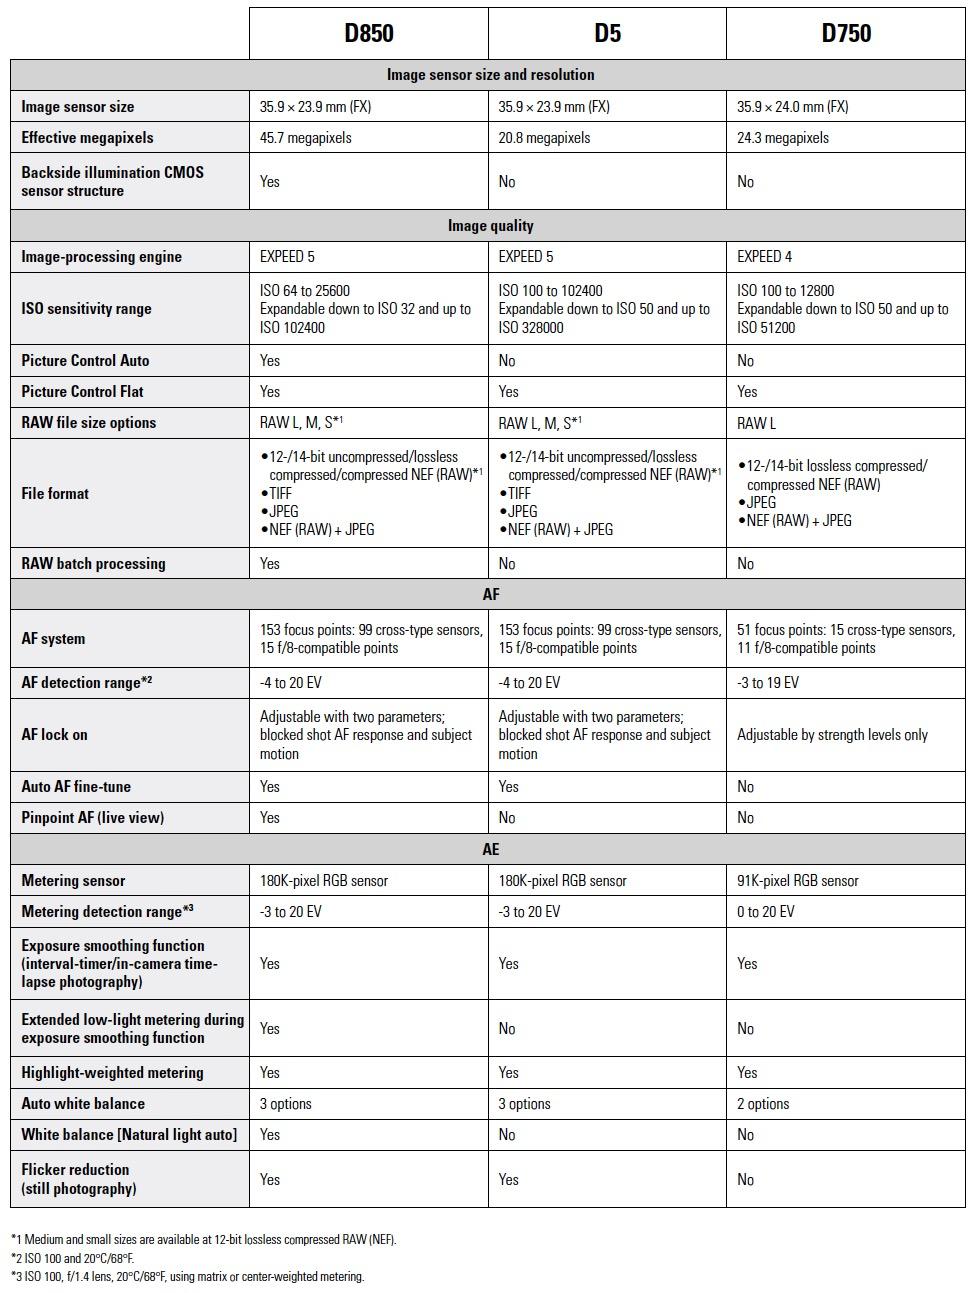 Nikon-D850-vs-D5-vs-D750-full-frame-DSLR